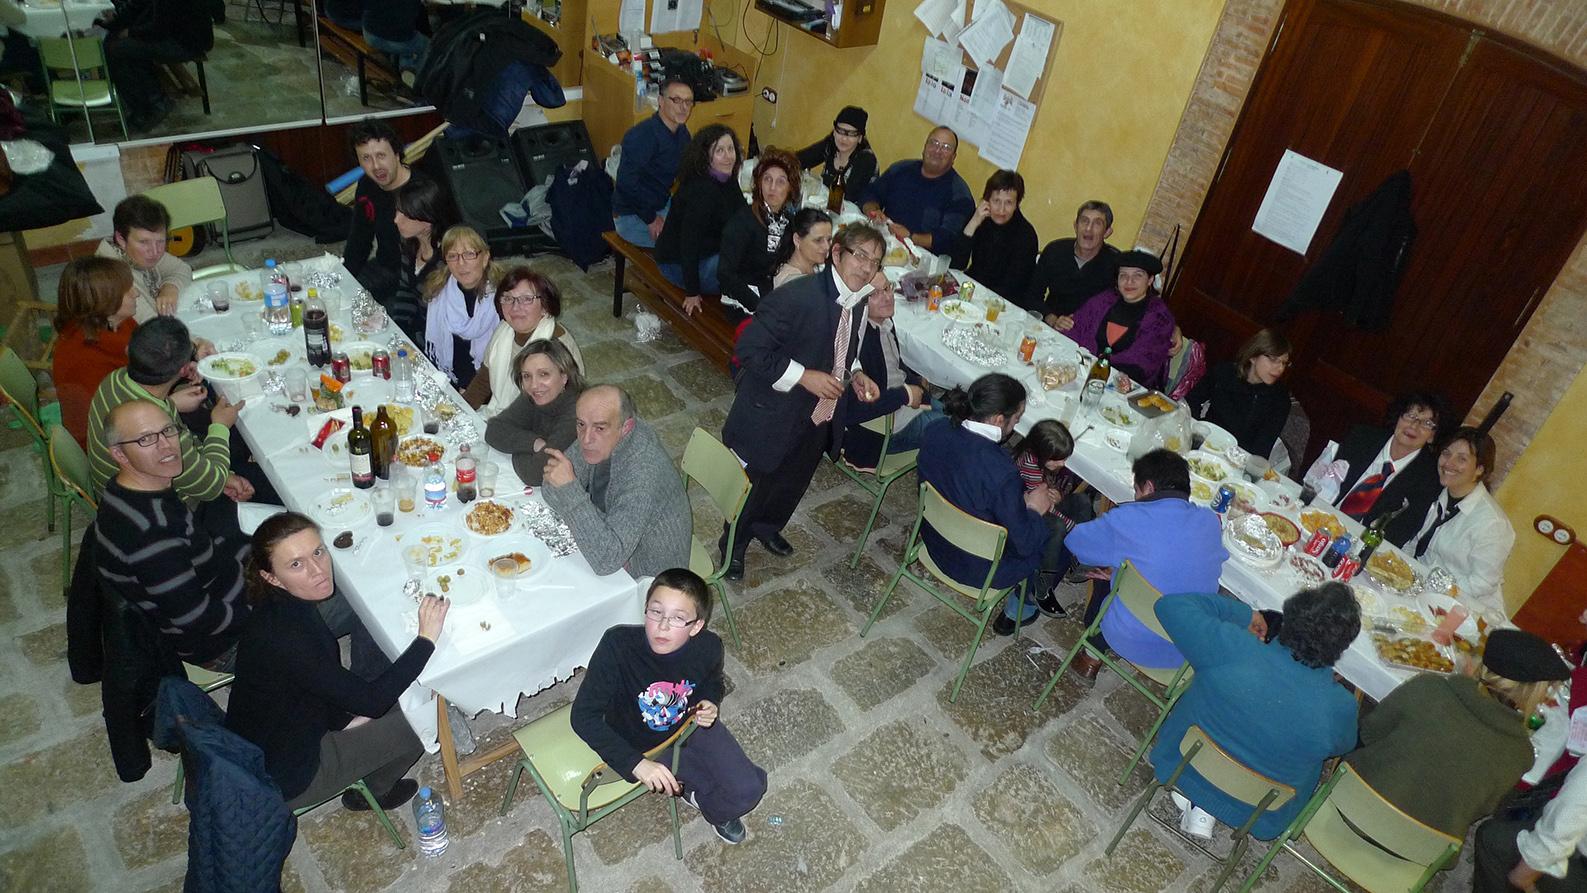 2014-03-01 Carnestoltes - Xirigota Rebeca Mare-FOTO.RAF (68)